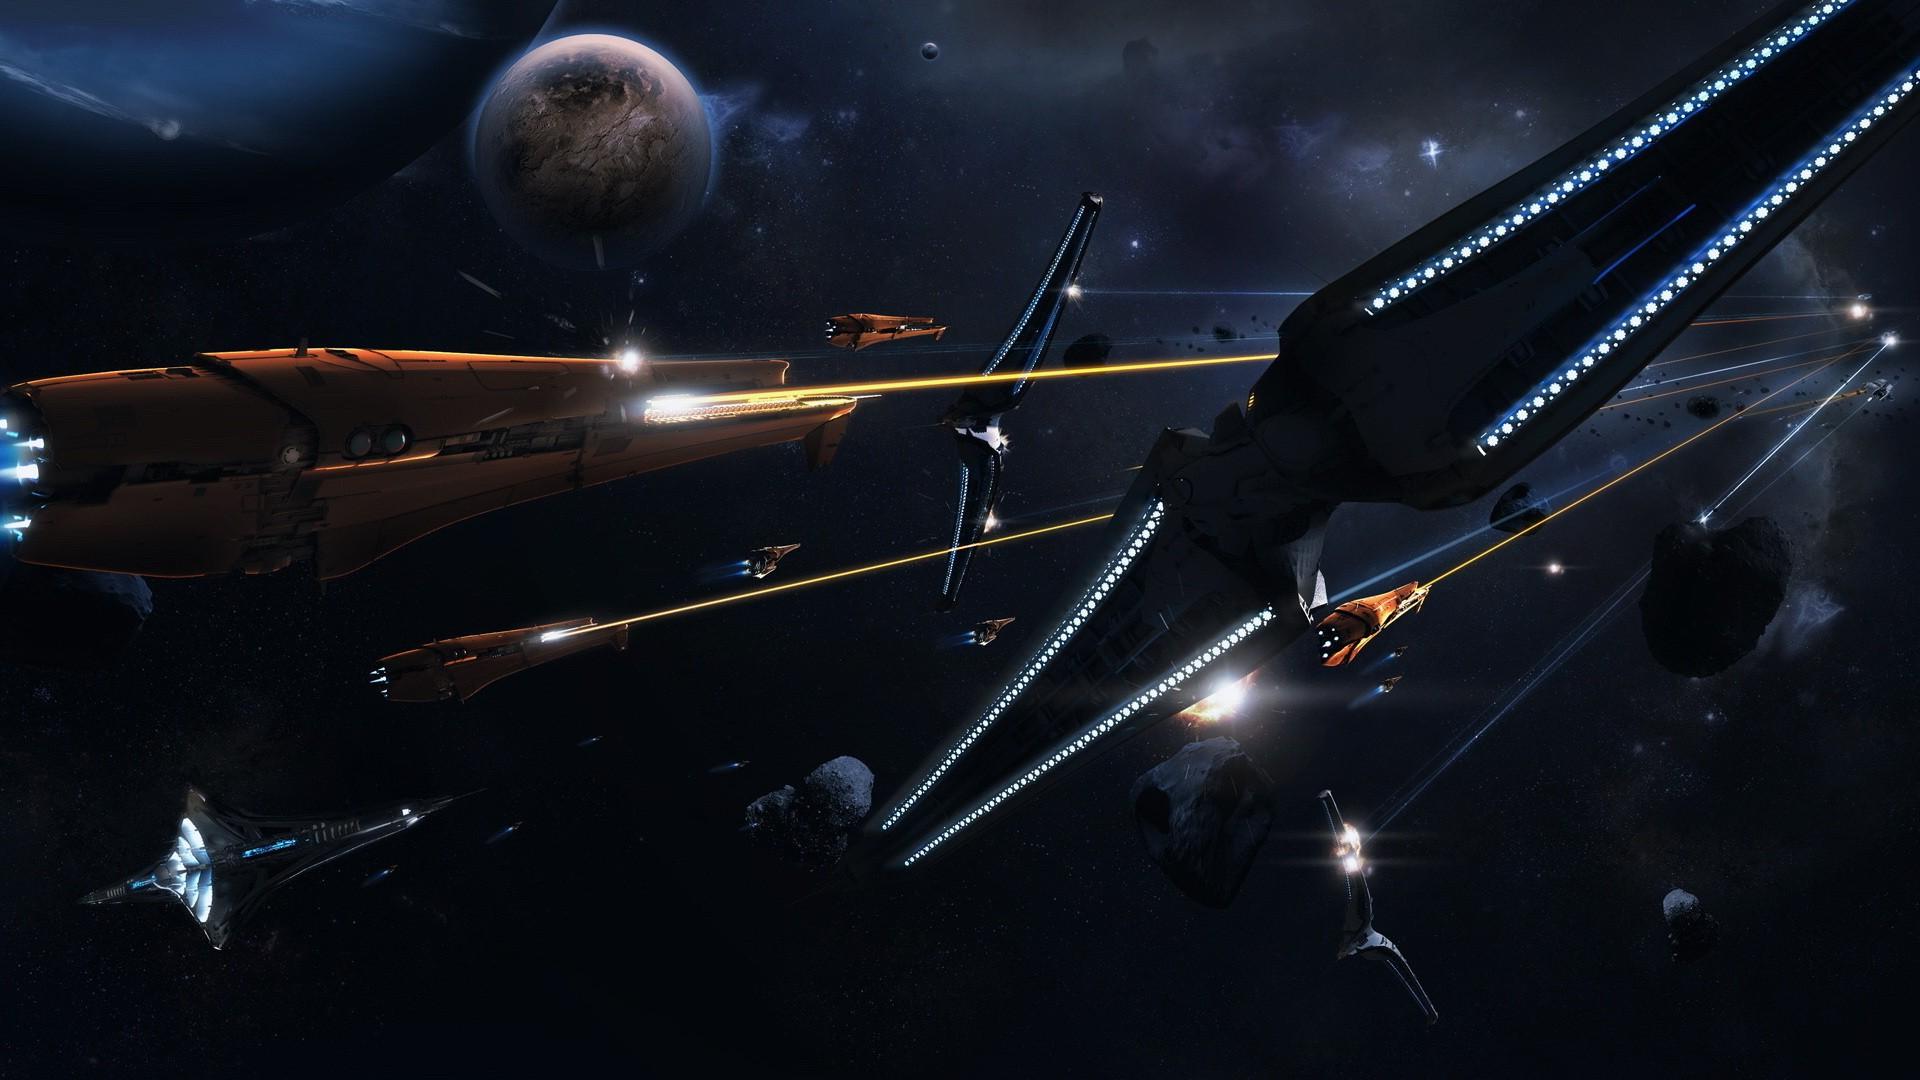 spaceship Artwork Digital Art Space War Stars Planet 1920x1080